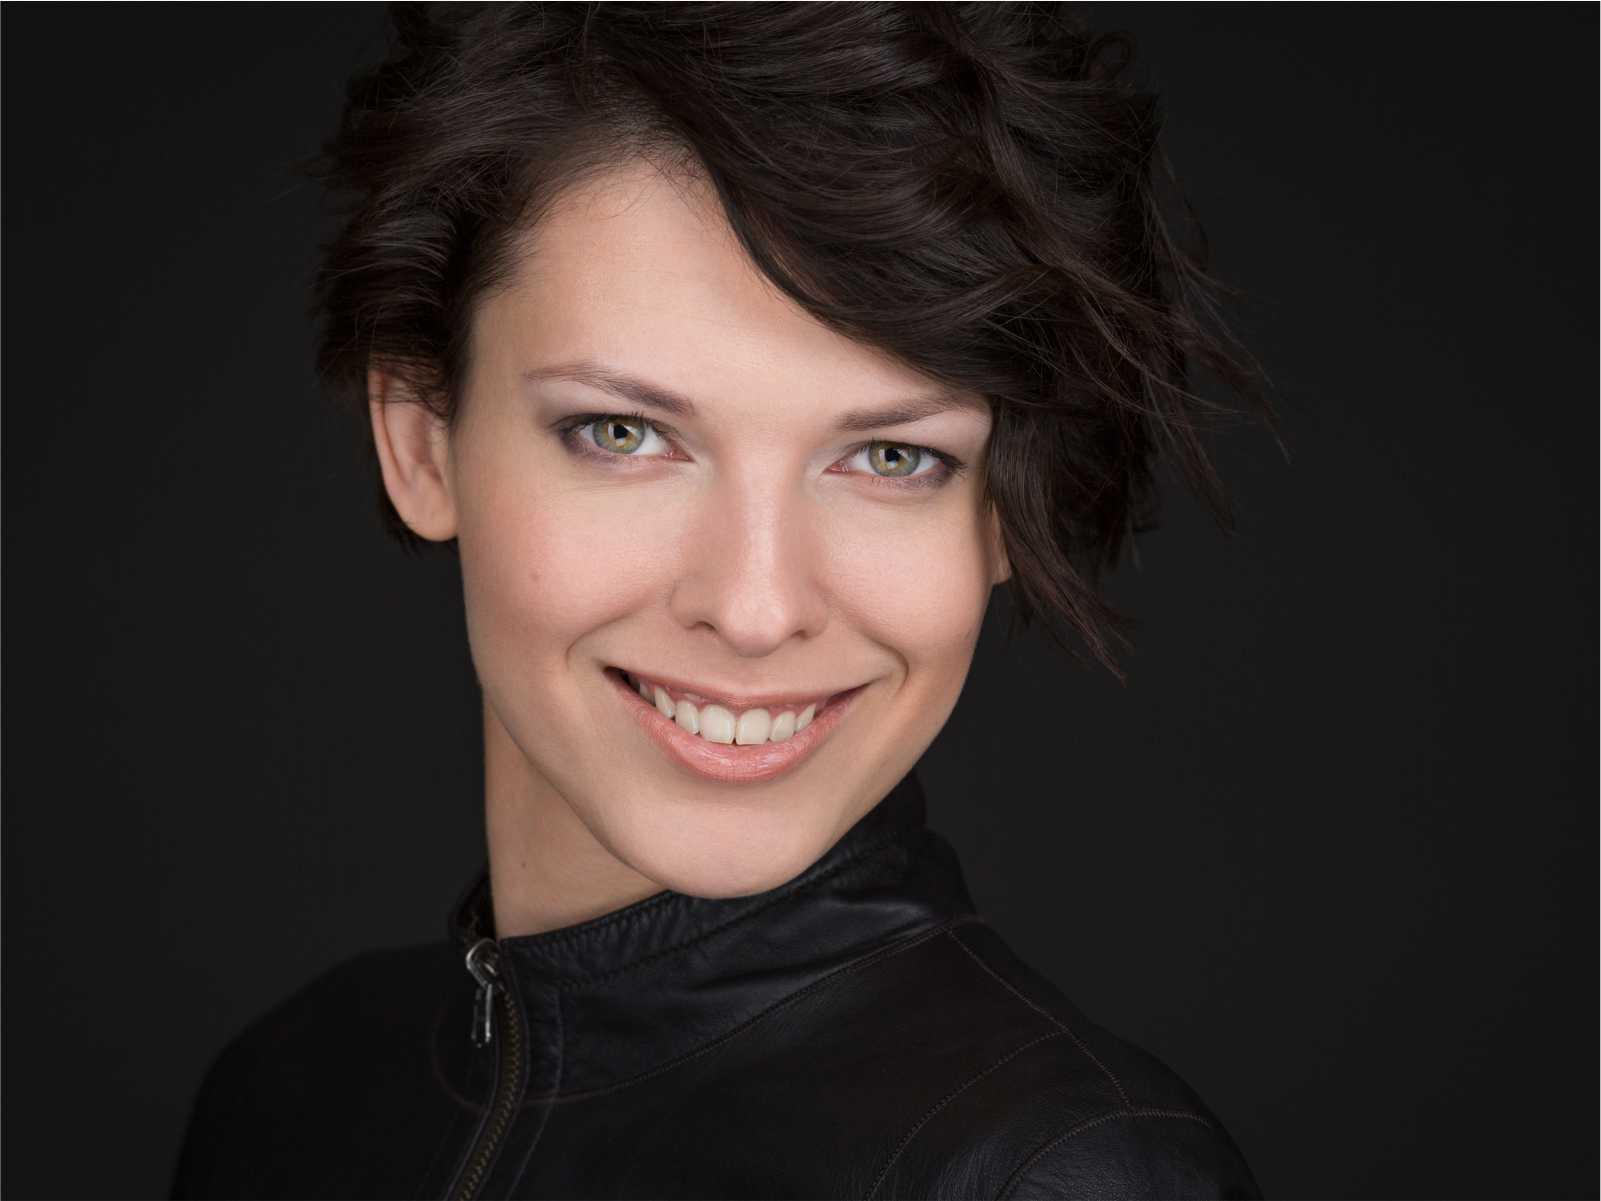 Анна Либер, художник и бизнесмен